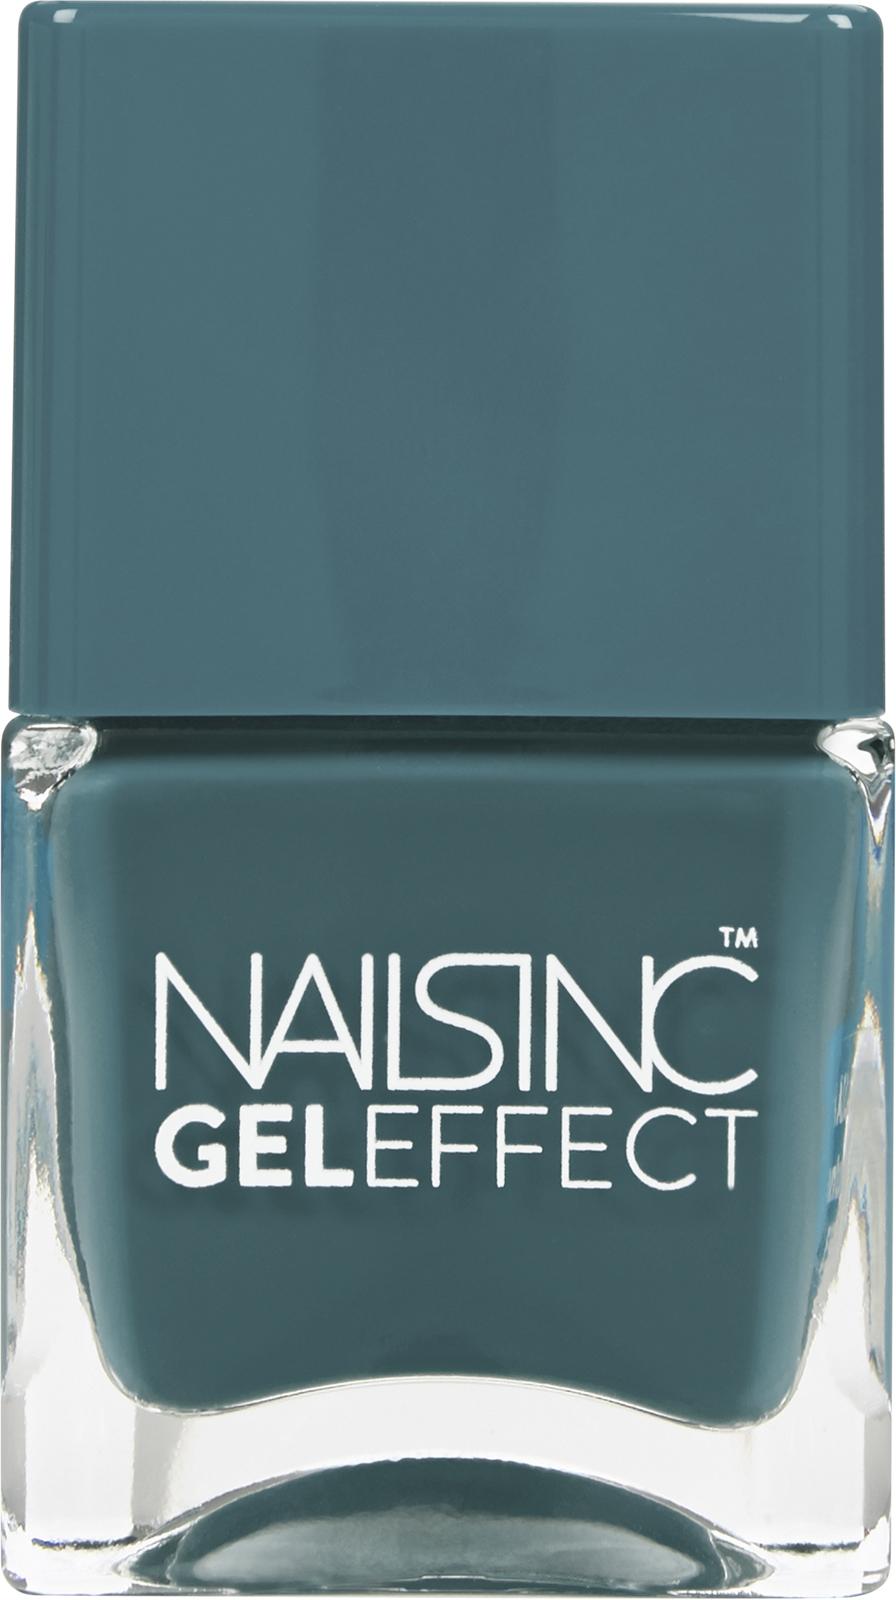 Nails Inc - Gel Effect Nail Lacquer 14 ml - Regal Lane